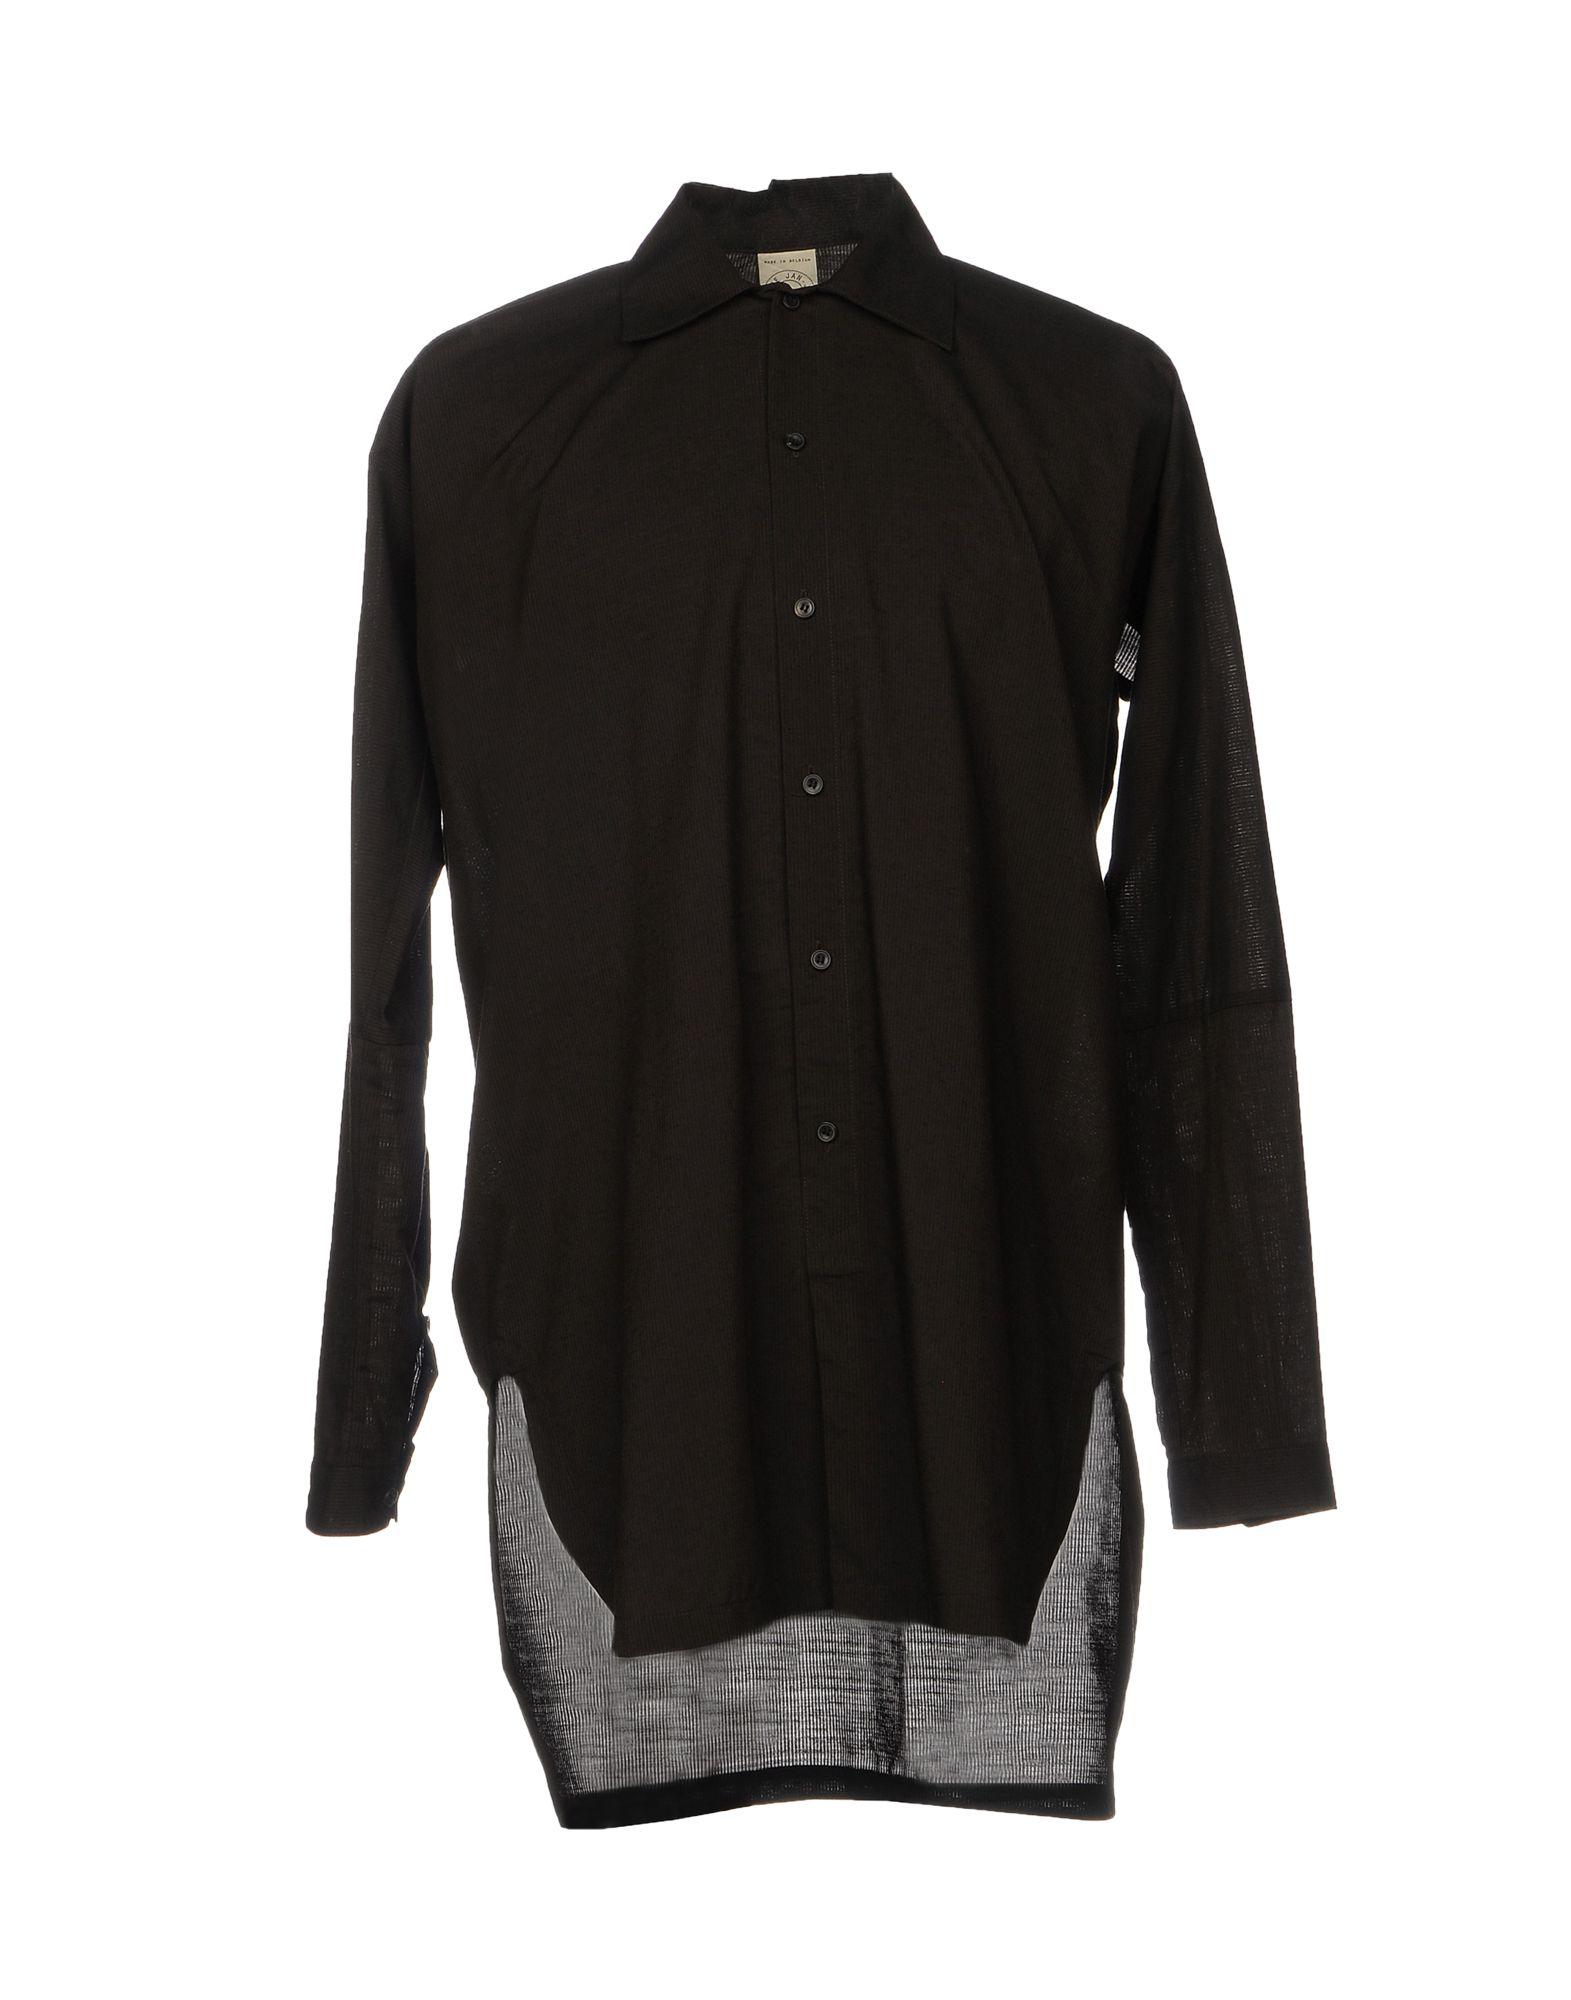 Camicia A Righe Jan - Jan Van Essche Uomo - Acquista online su